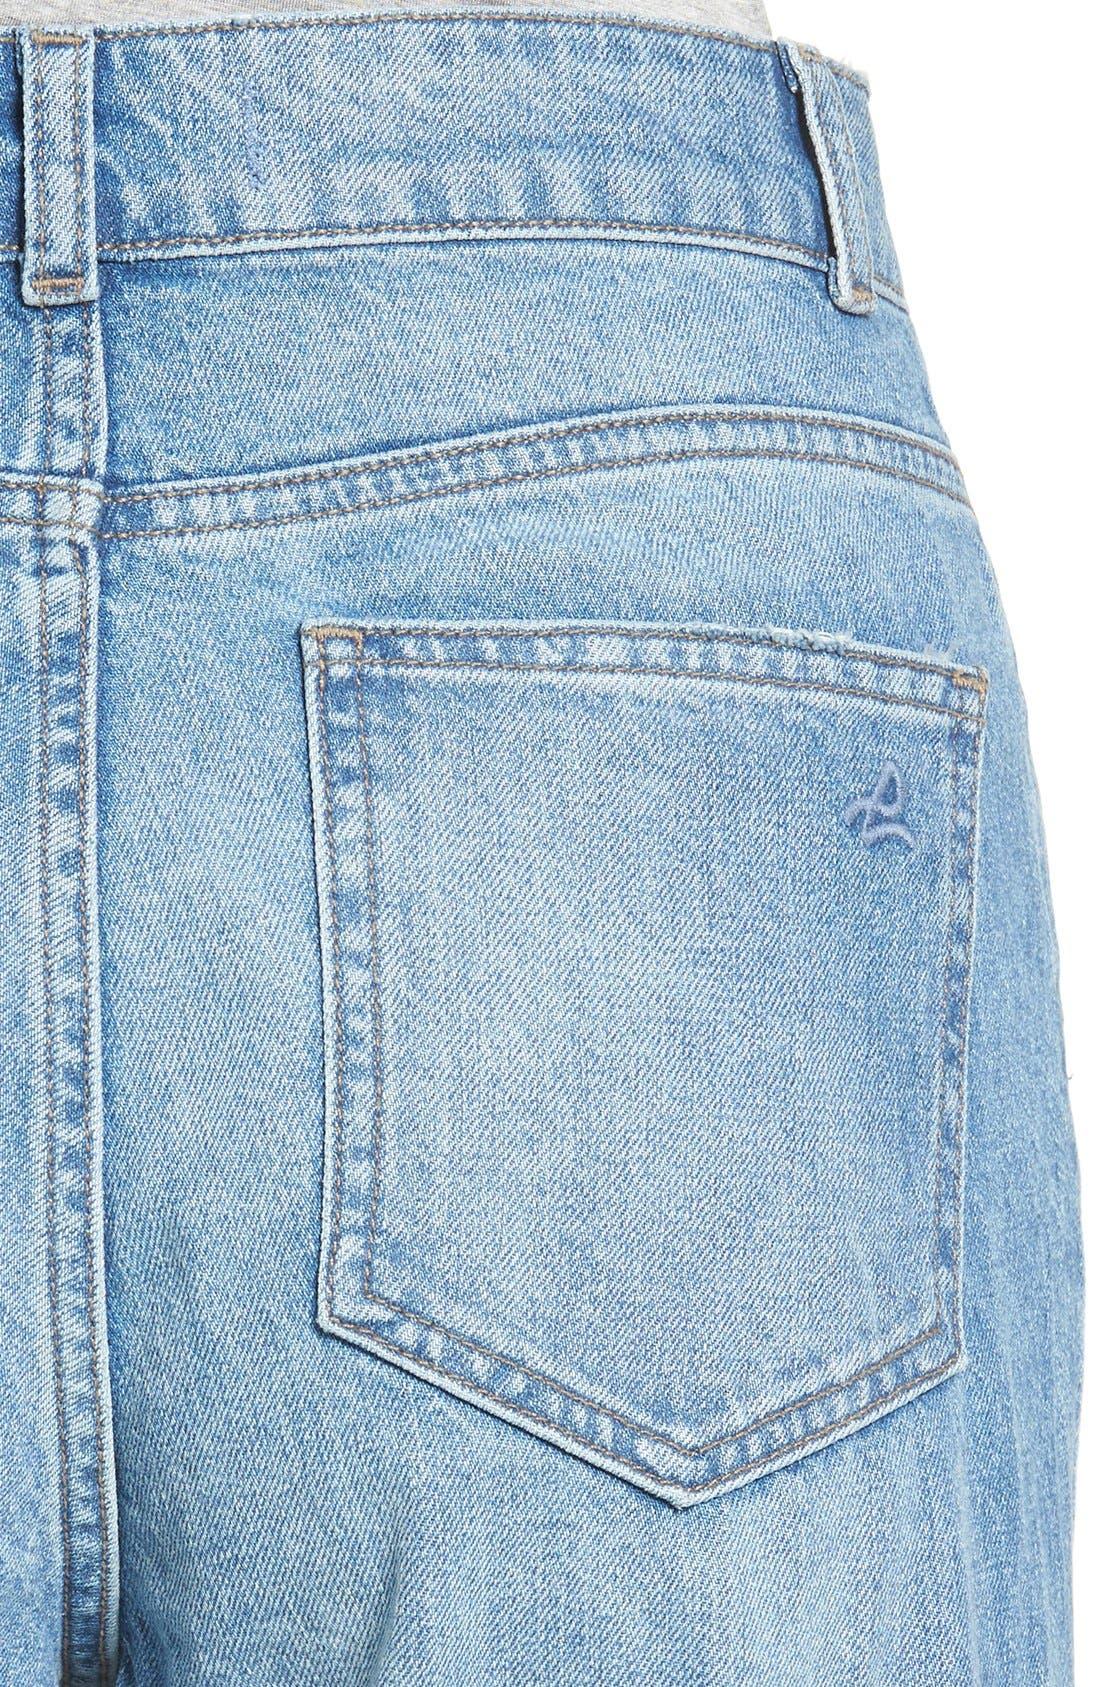 Hepburn High Rise Wide Leg Jeans,                             Alternate thumbnail 4, color,                             Slate